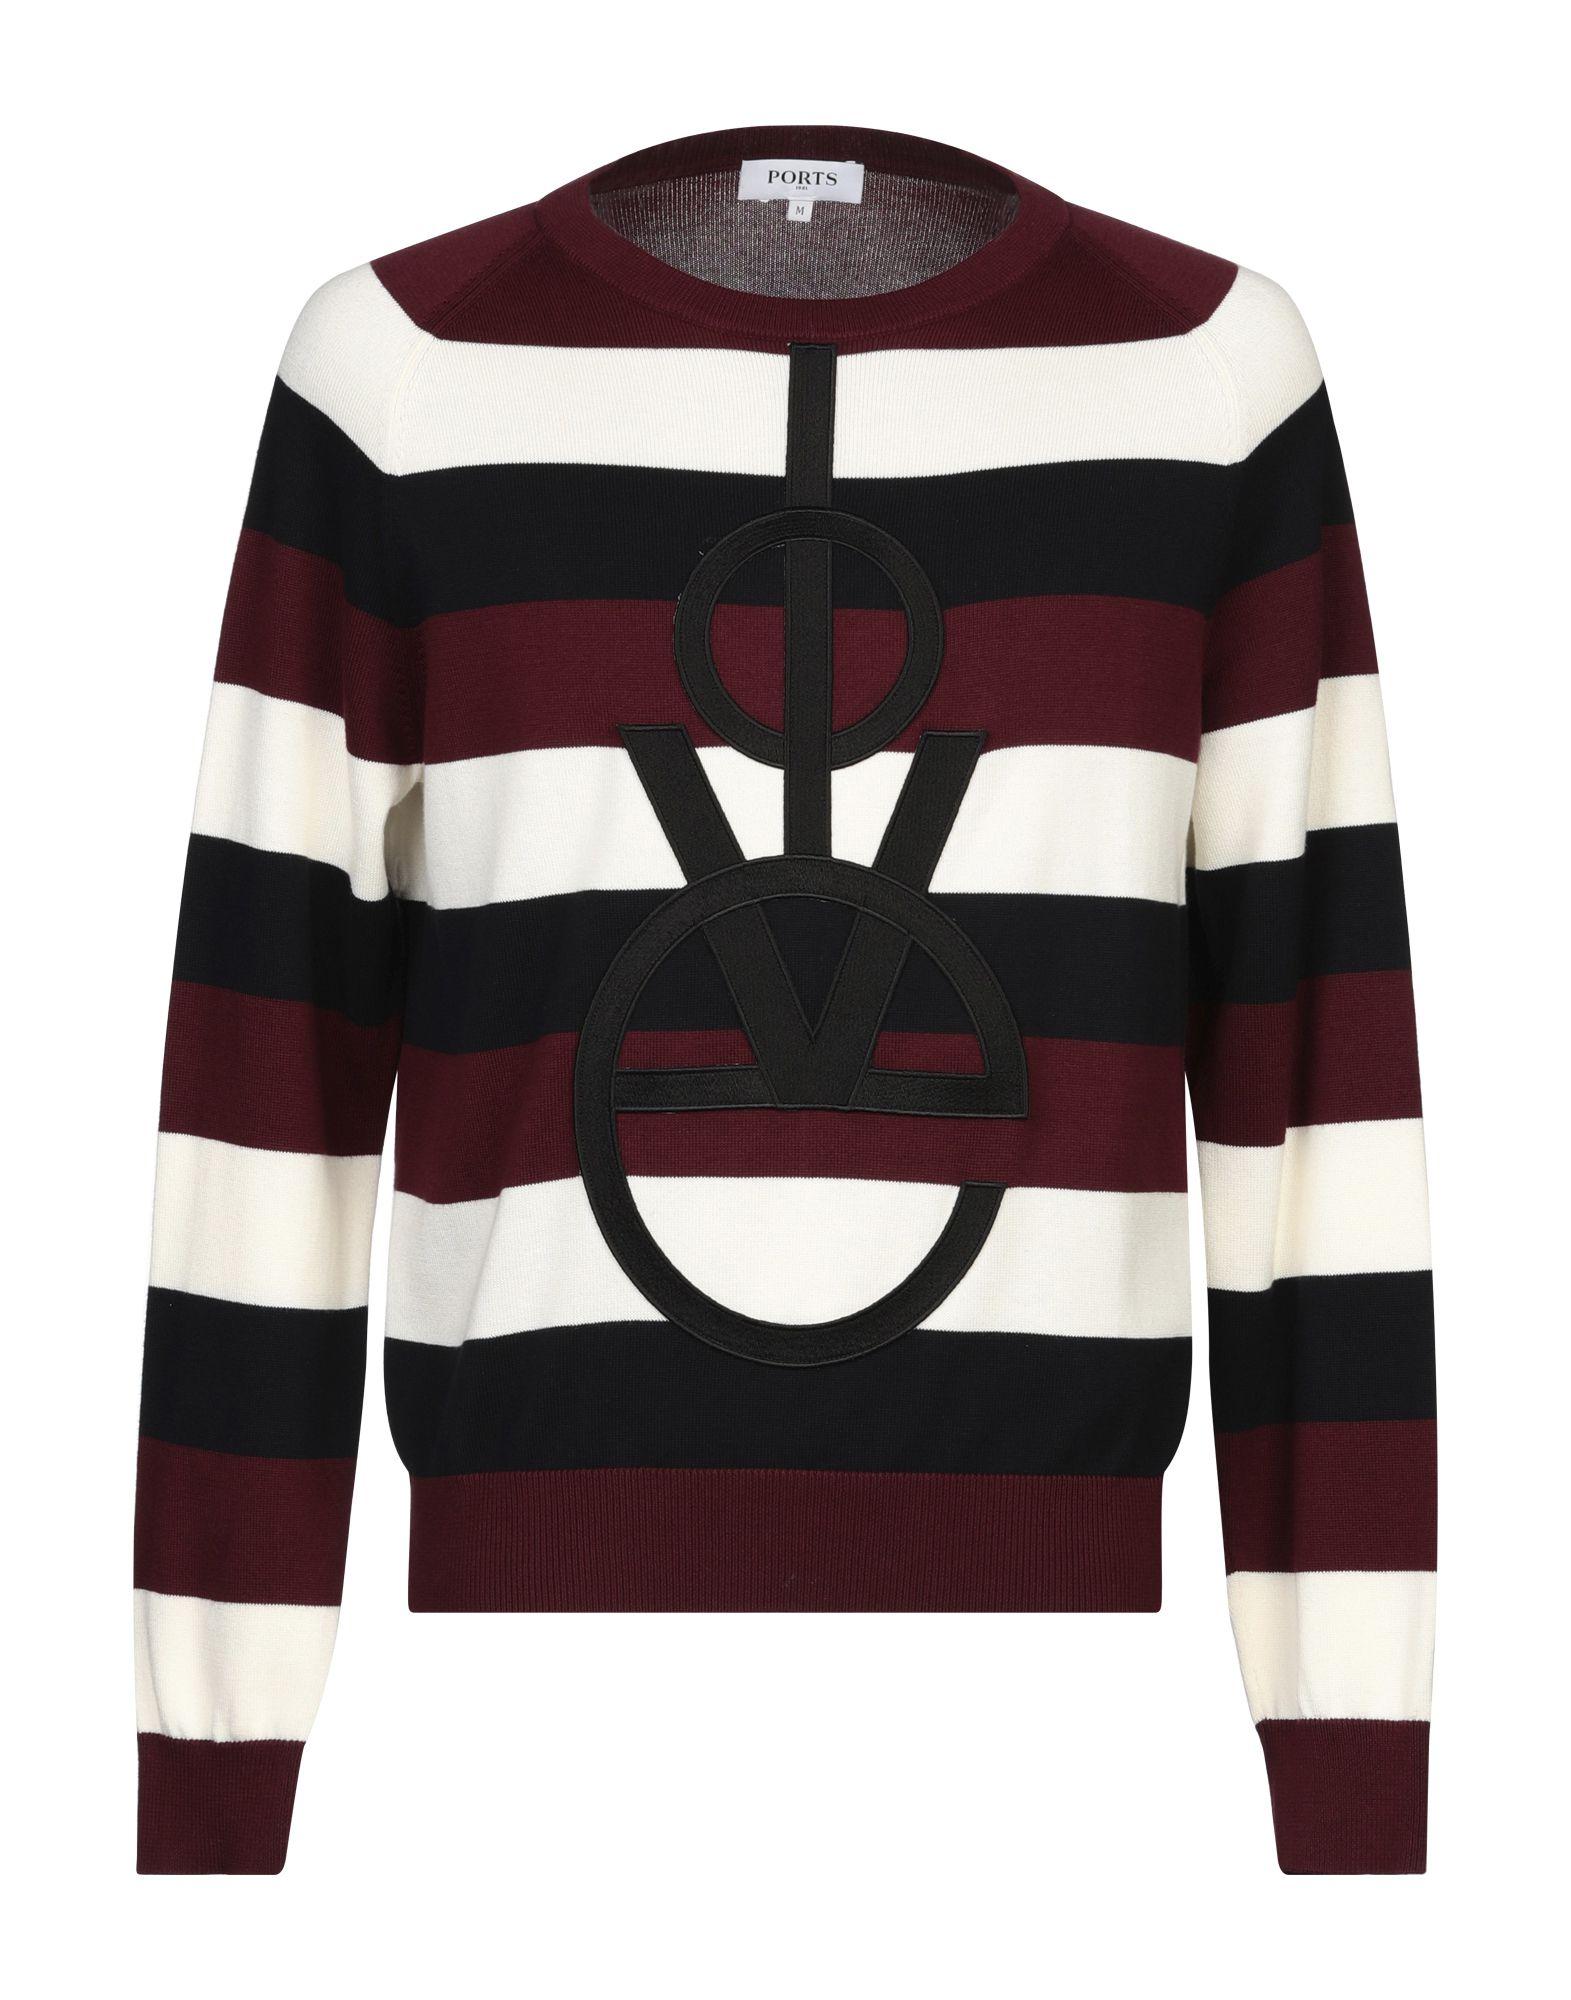 PORTS 1961 Свитер biarritz 1961 свитер